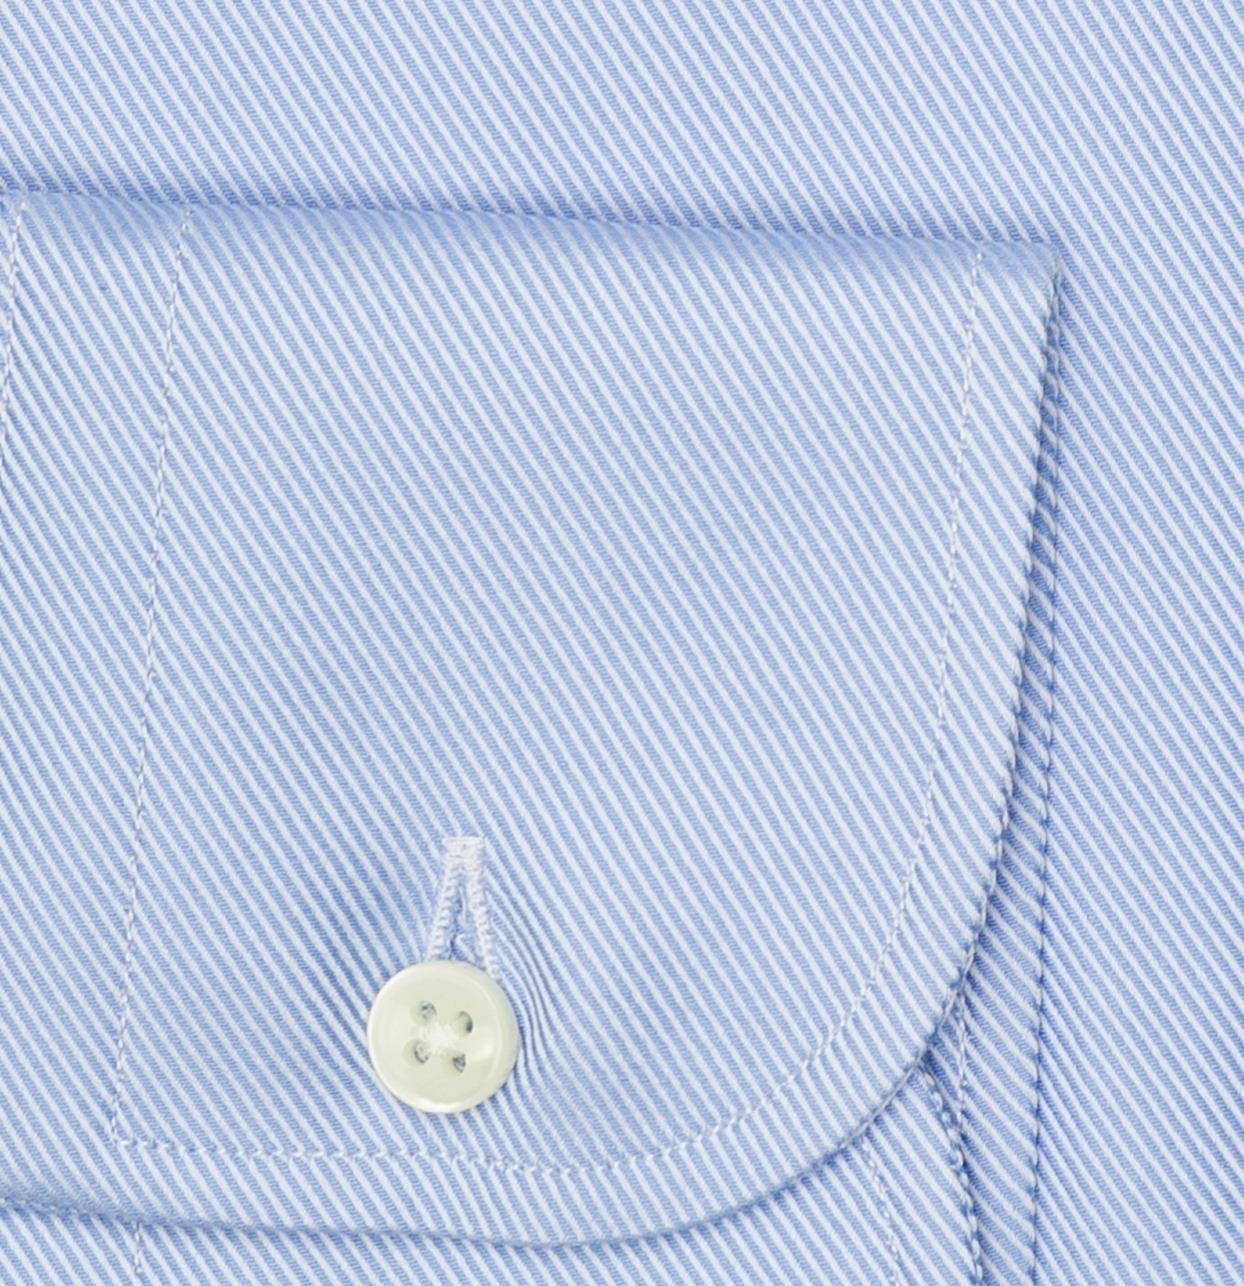 Camisa Formal Wear REGULAR FIT cuello Italiano, modelo NAPOLI tejido twill color azul, 100% Algodón. - Ítem2